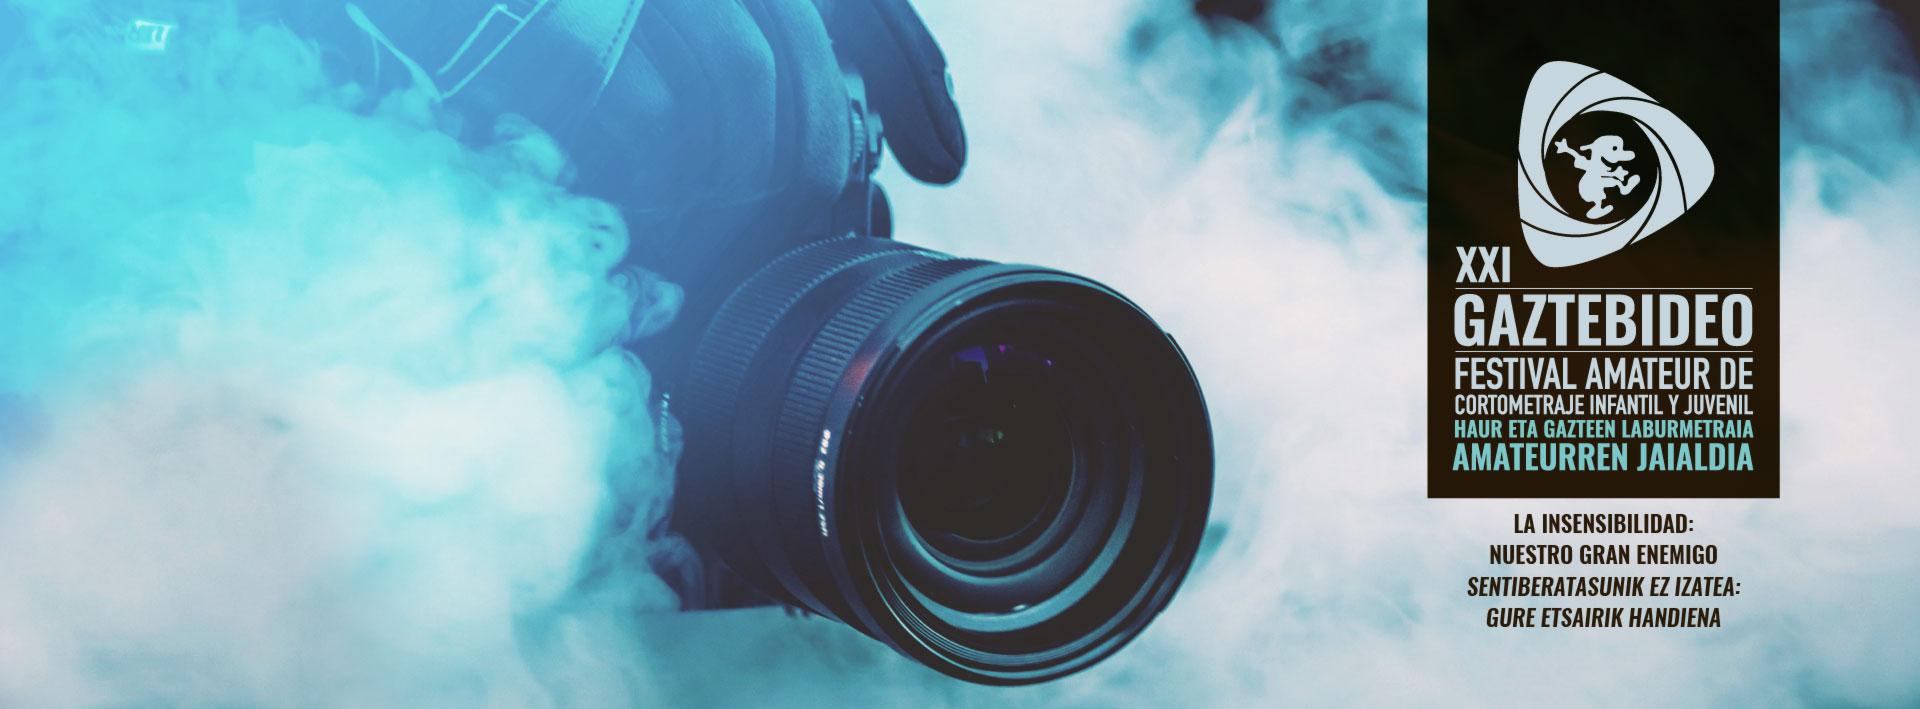 Gaztebideo XXI Festival Amateur de Video Juvenil